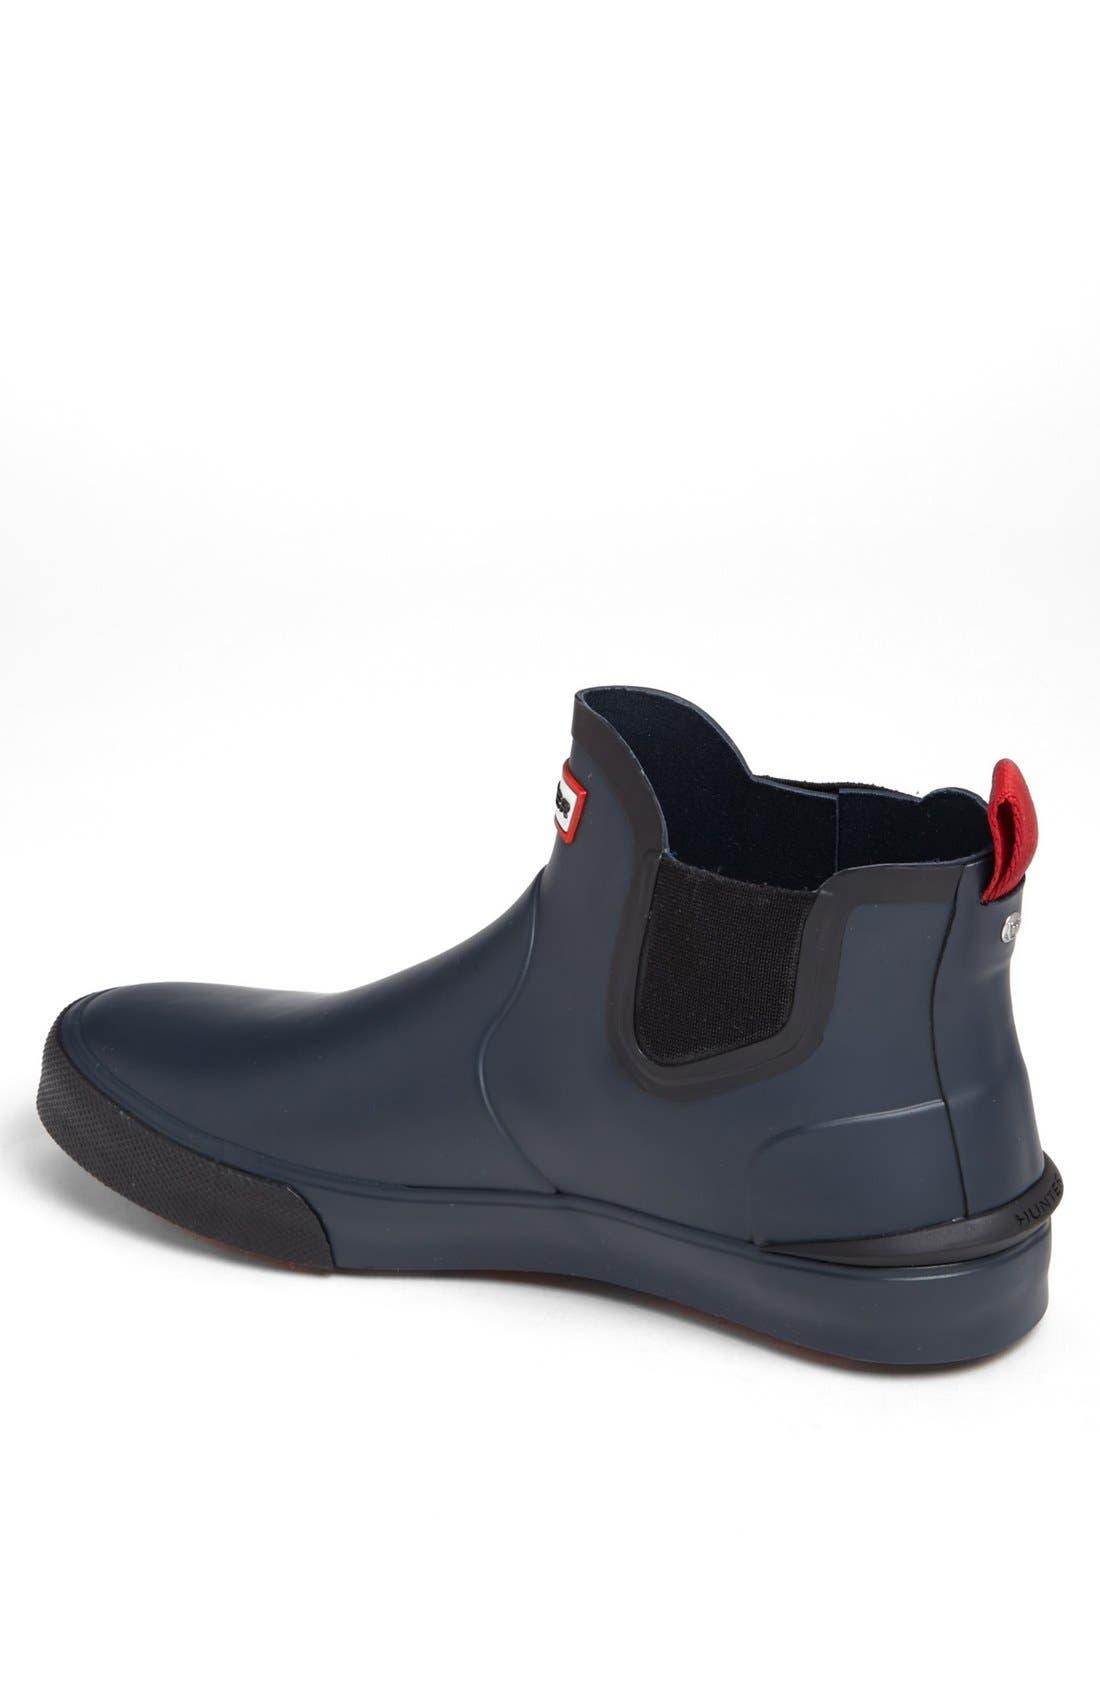 'Daleton' Boot,                             Alternate thumbnail 2, color,                             Navy